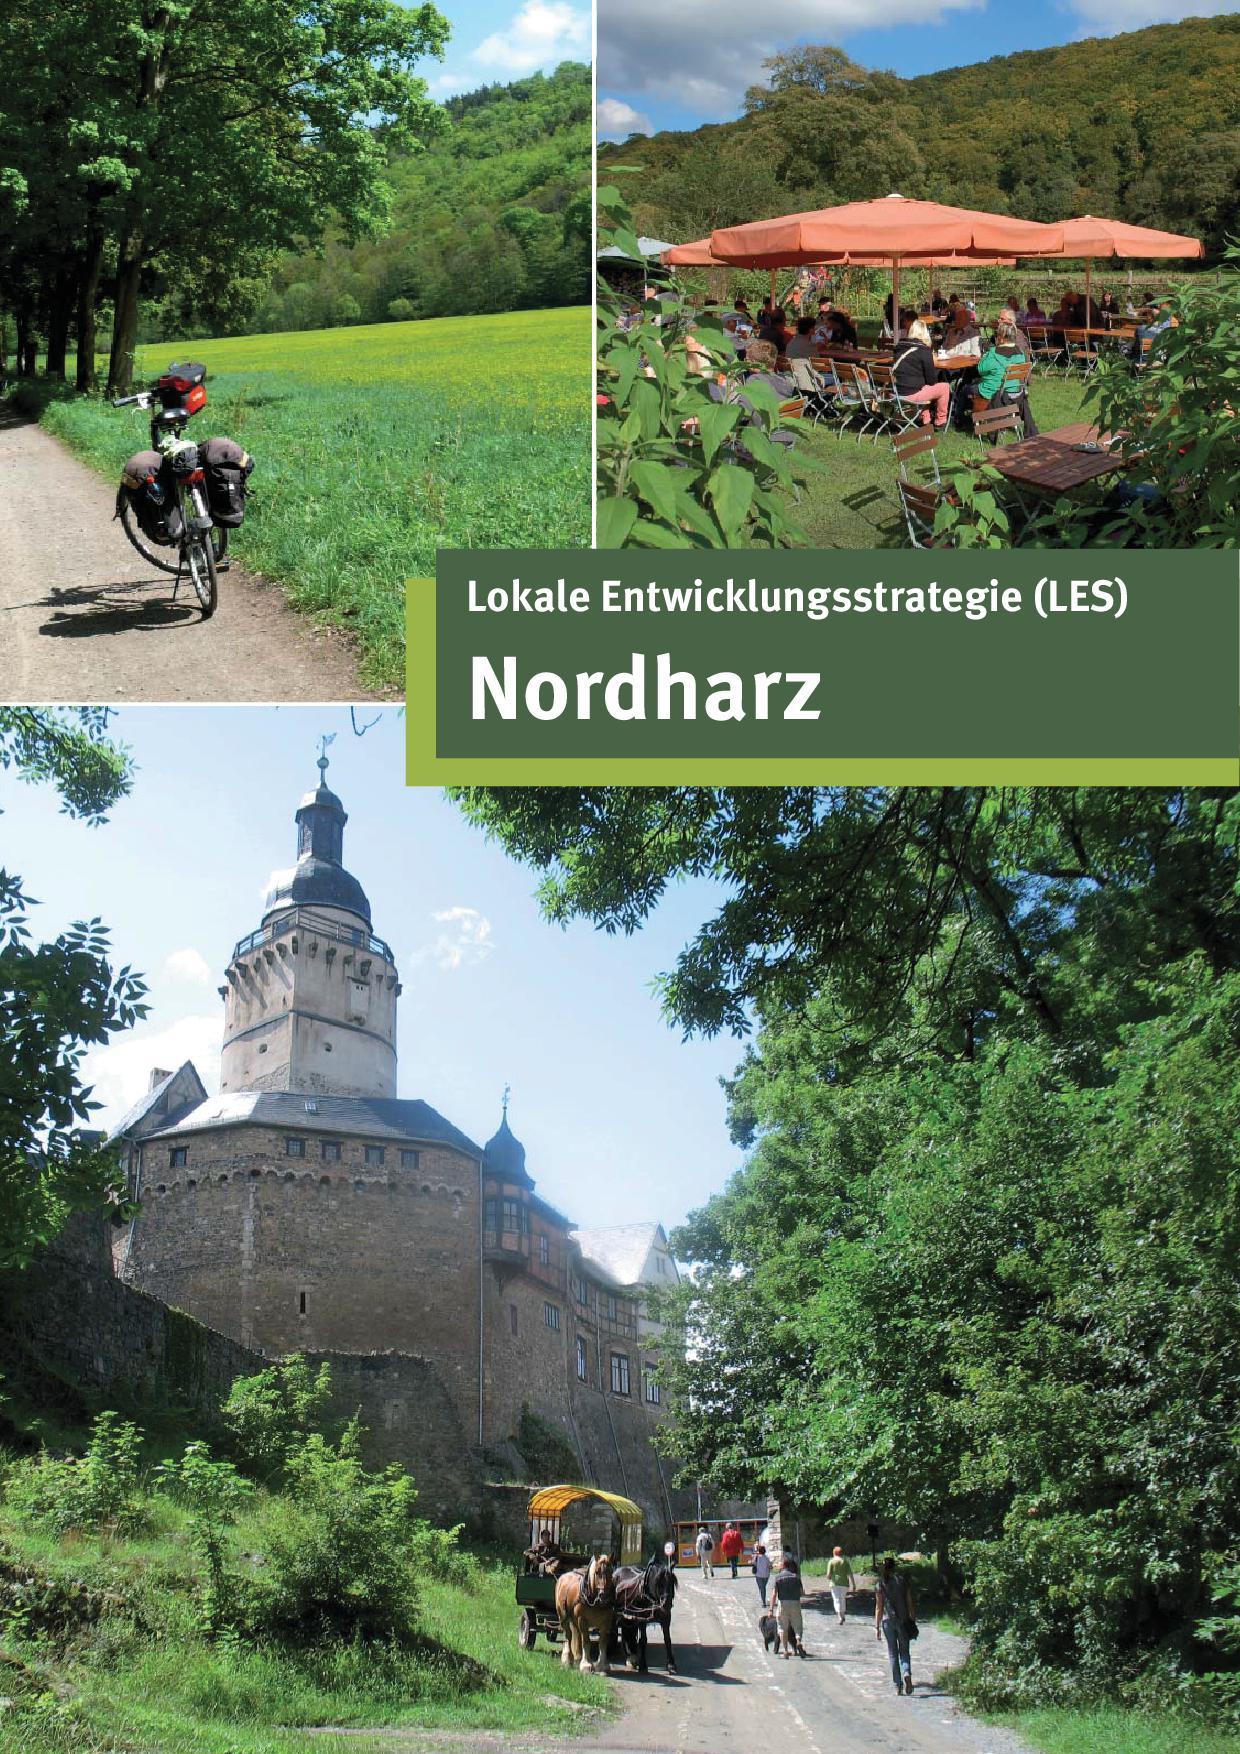 Nordharz